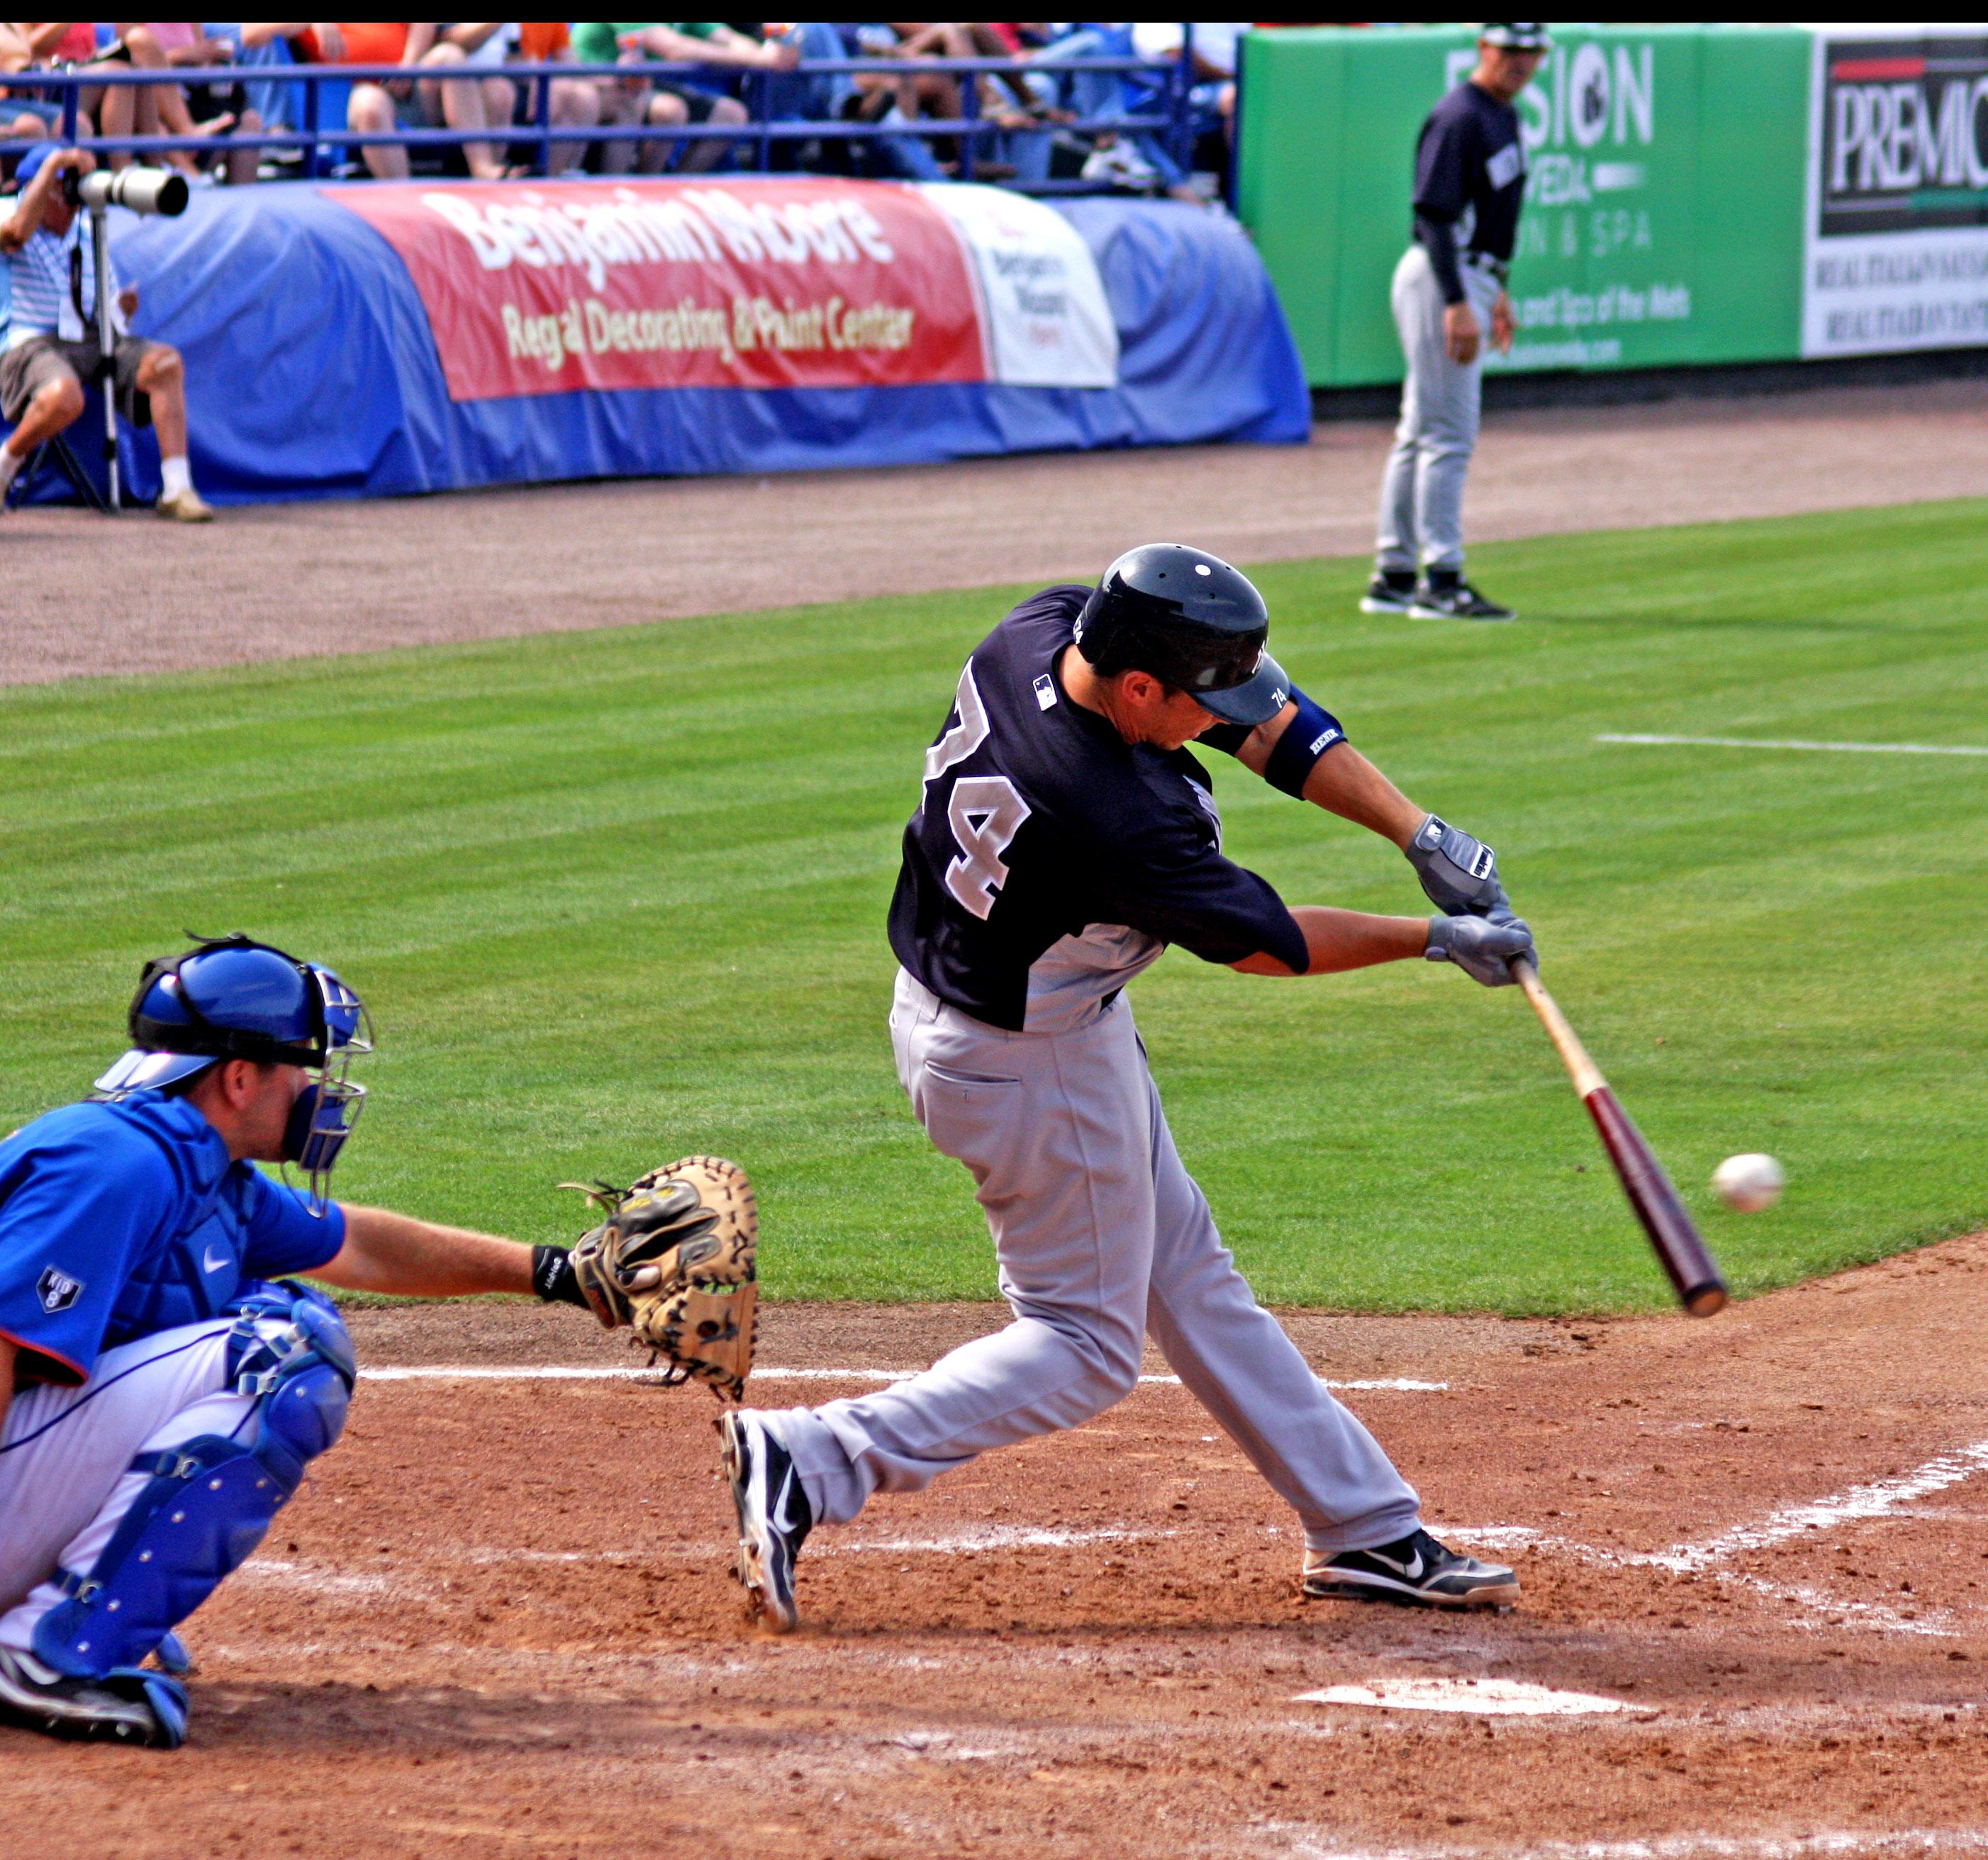 10 life lessons learned from baseball pro baseball insider - HD1200×1123